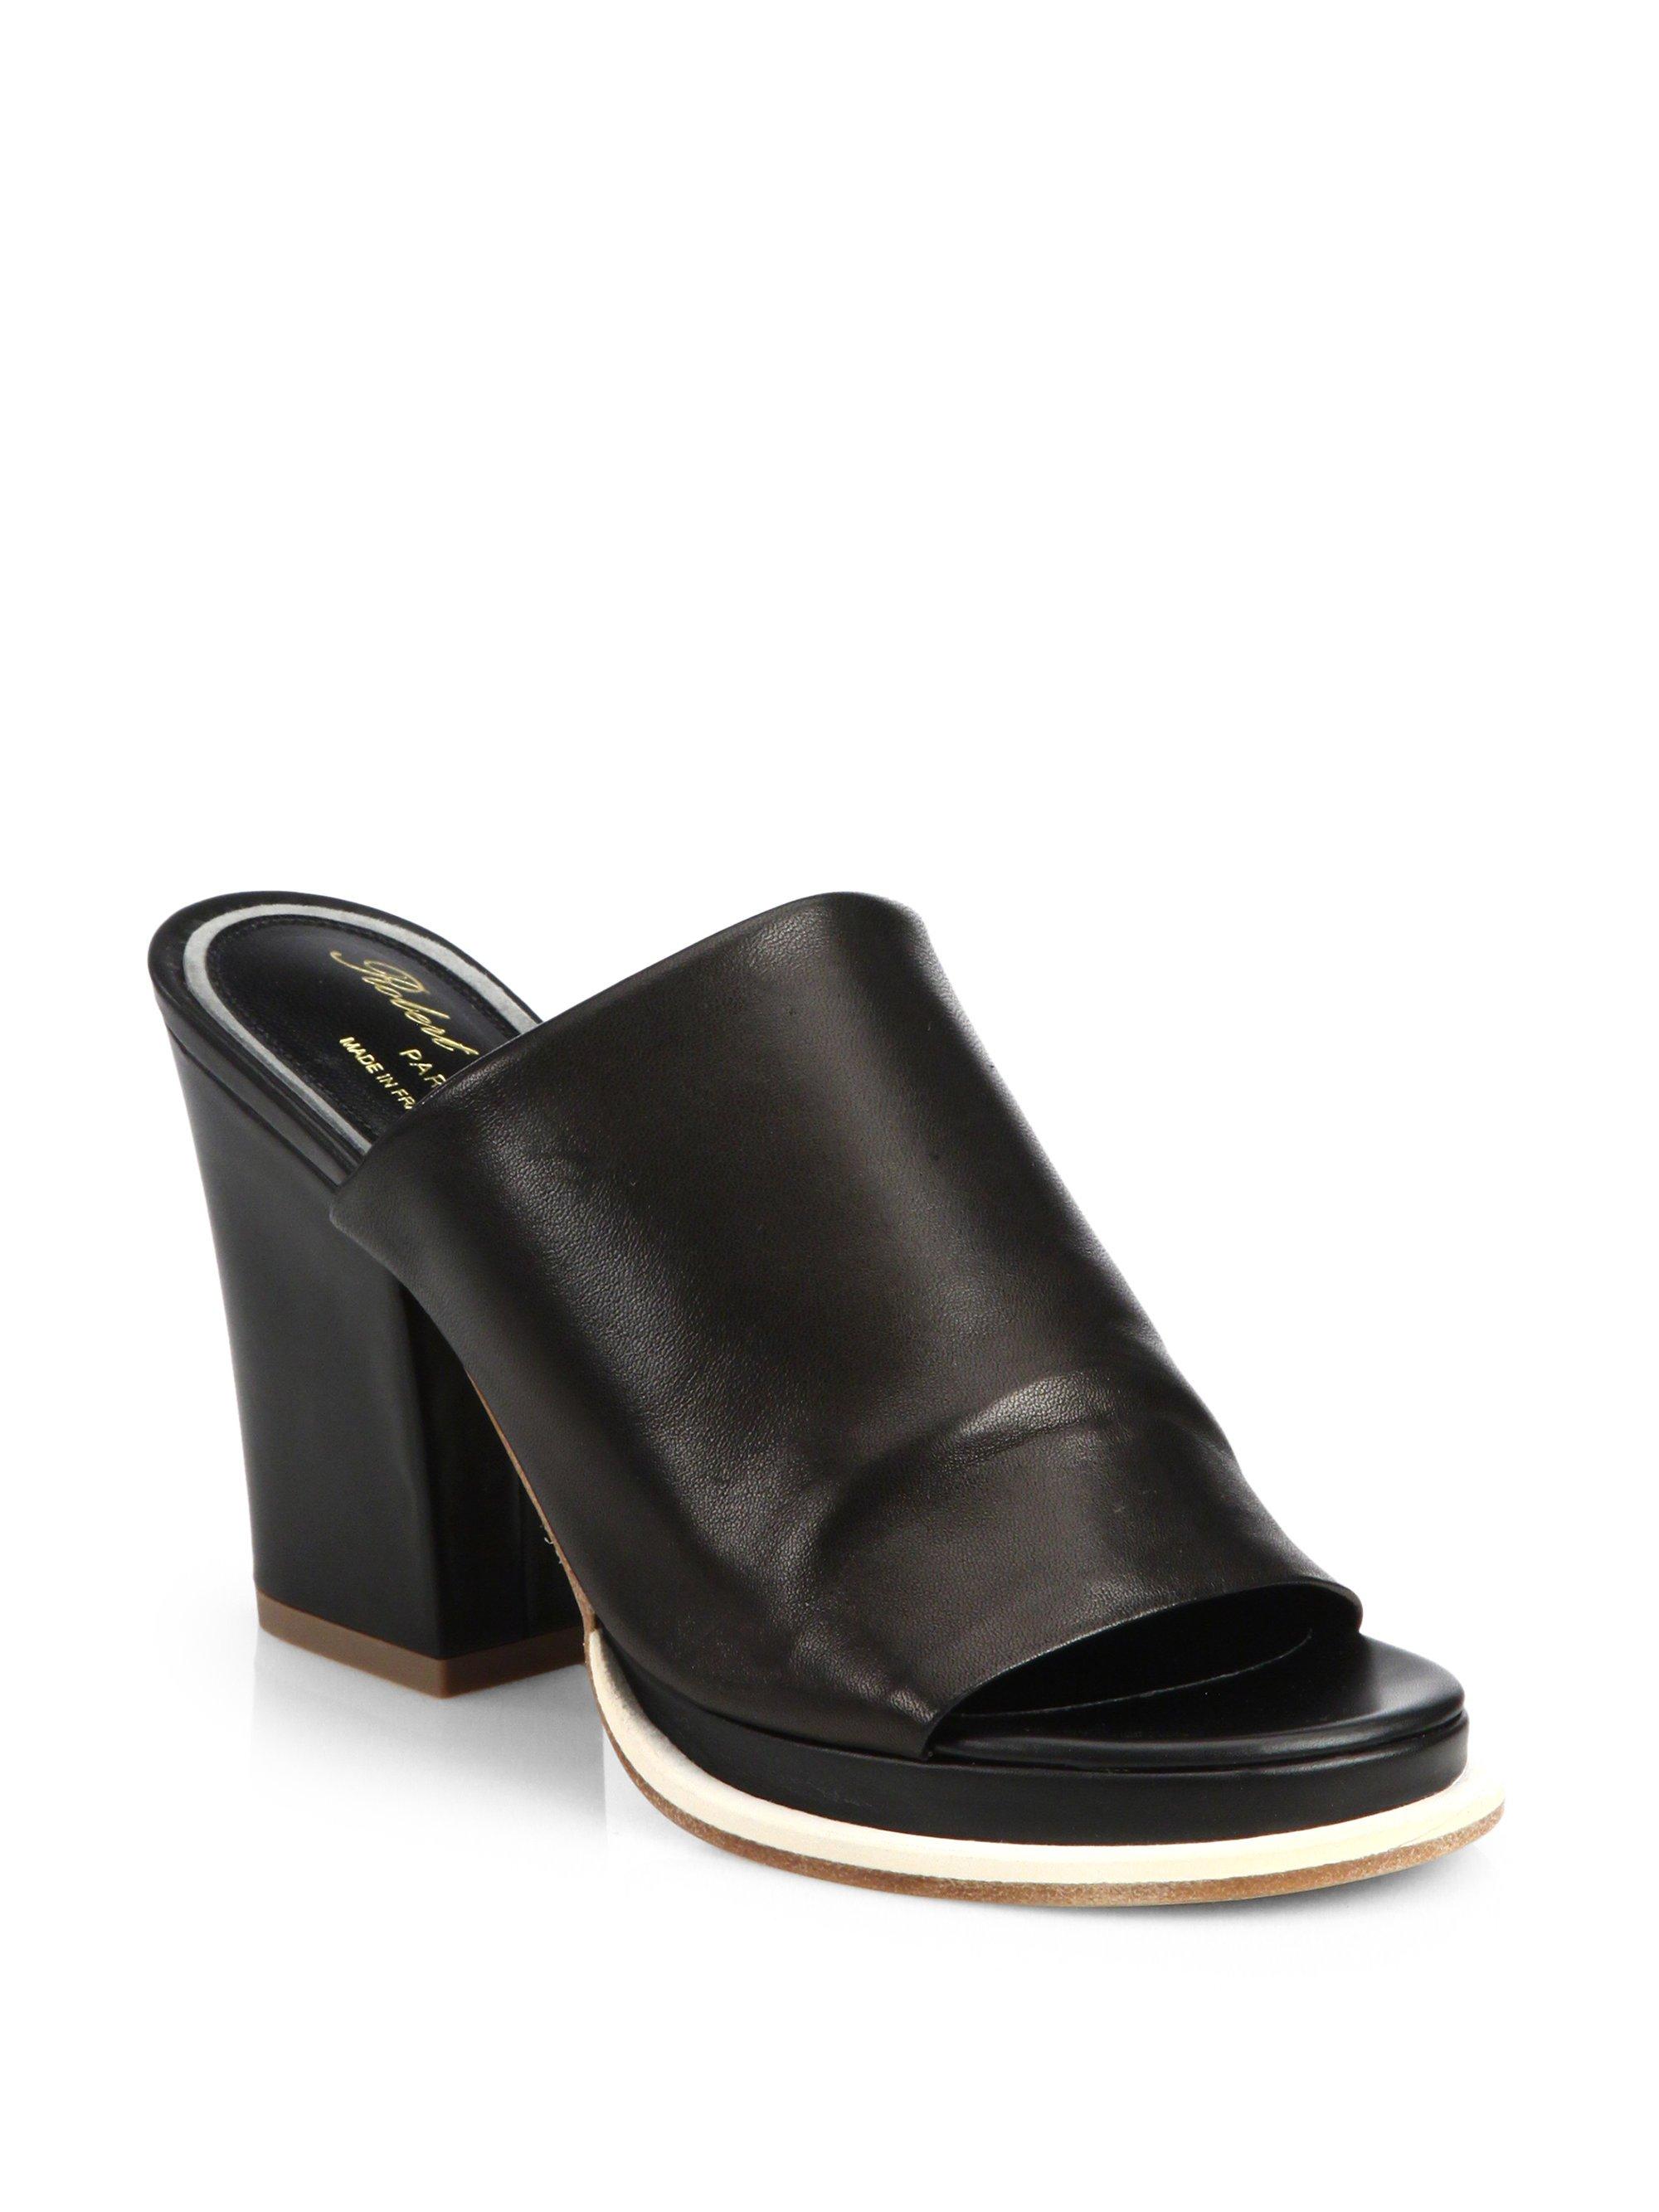 Robert Clergerie Leather Block Heel Mules In Black Lyst